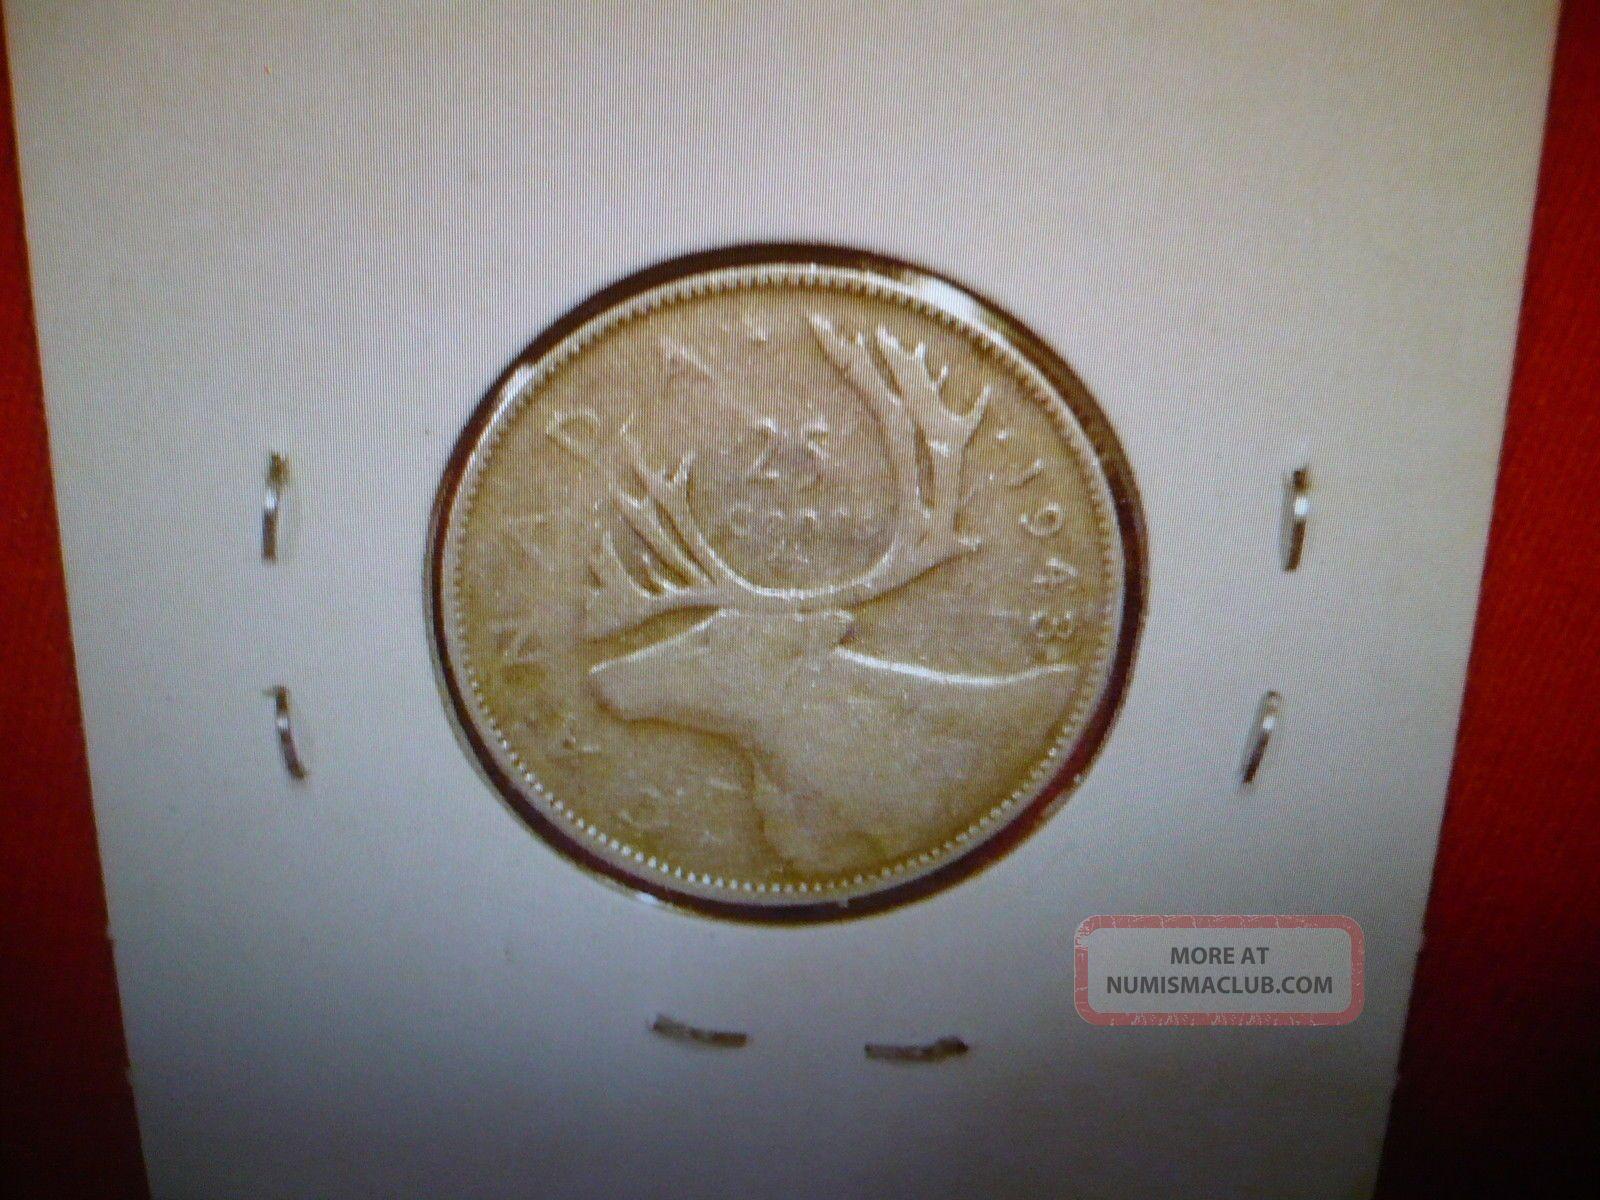 Silver 1943 Canada 25 Cents King George Vi Quarter Dollar Wwii Era Coin